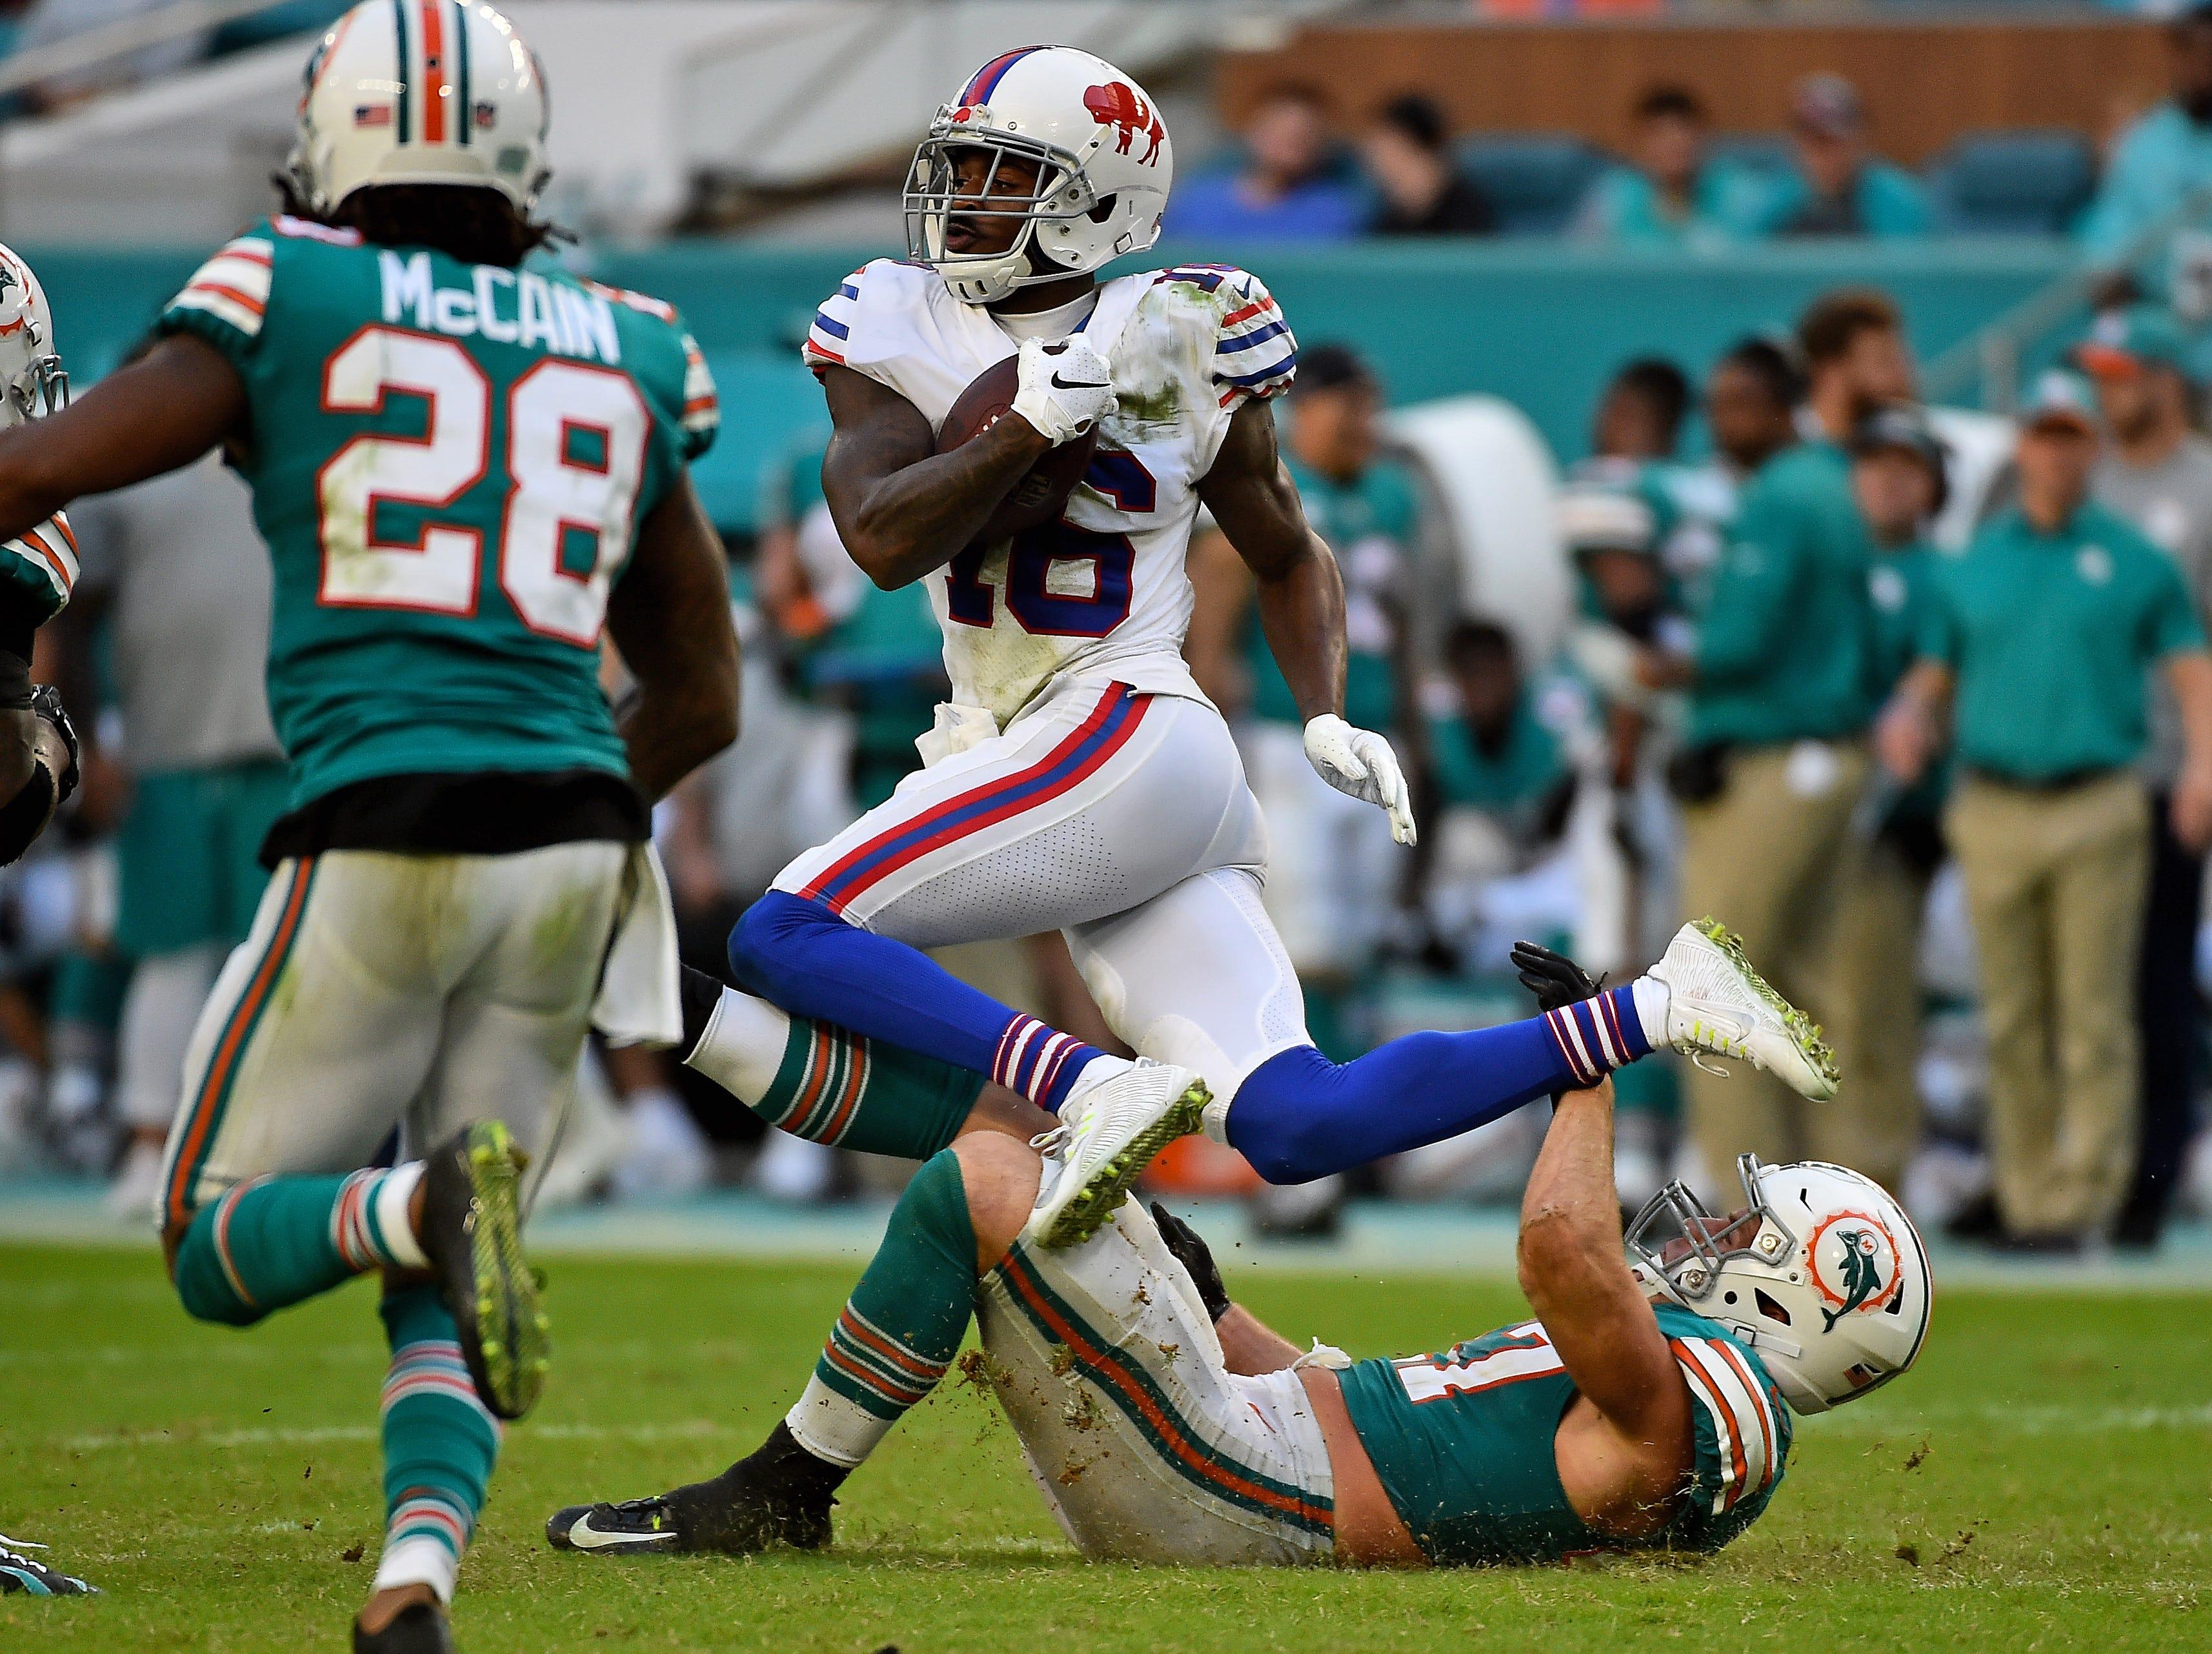 Dec 2, 2018; Miami Gardens, FL, USA; Miami Dolphins outside linebacker Kiko Alonso (47) trips up Buffalo Bills wide receiver Robert Foster (16) during the second half at Hard Rock Stadium. Mandatory Credit: Jasen Vinlove-USA TODAY Sports